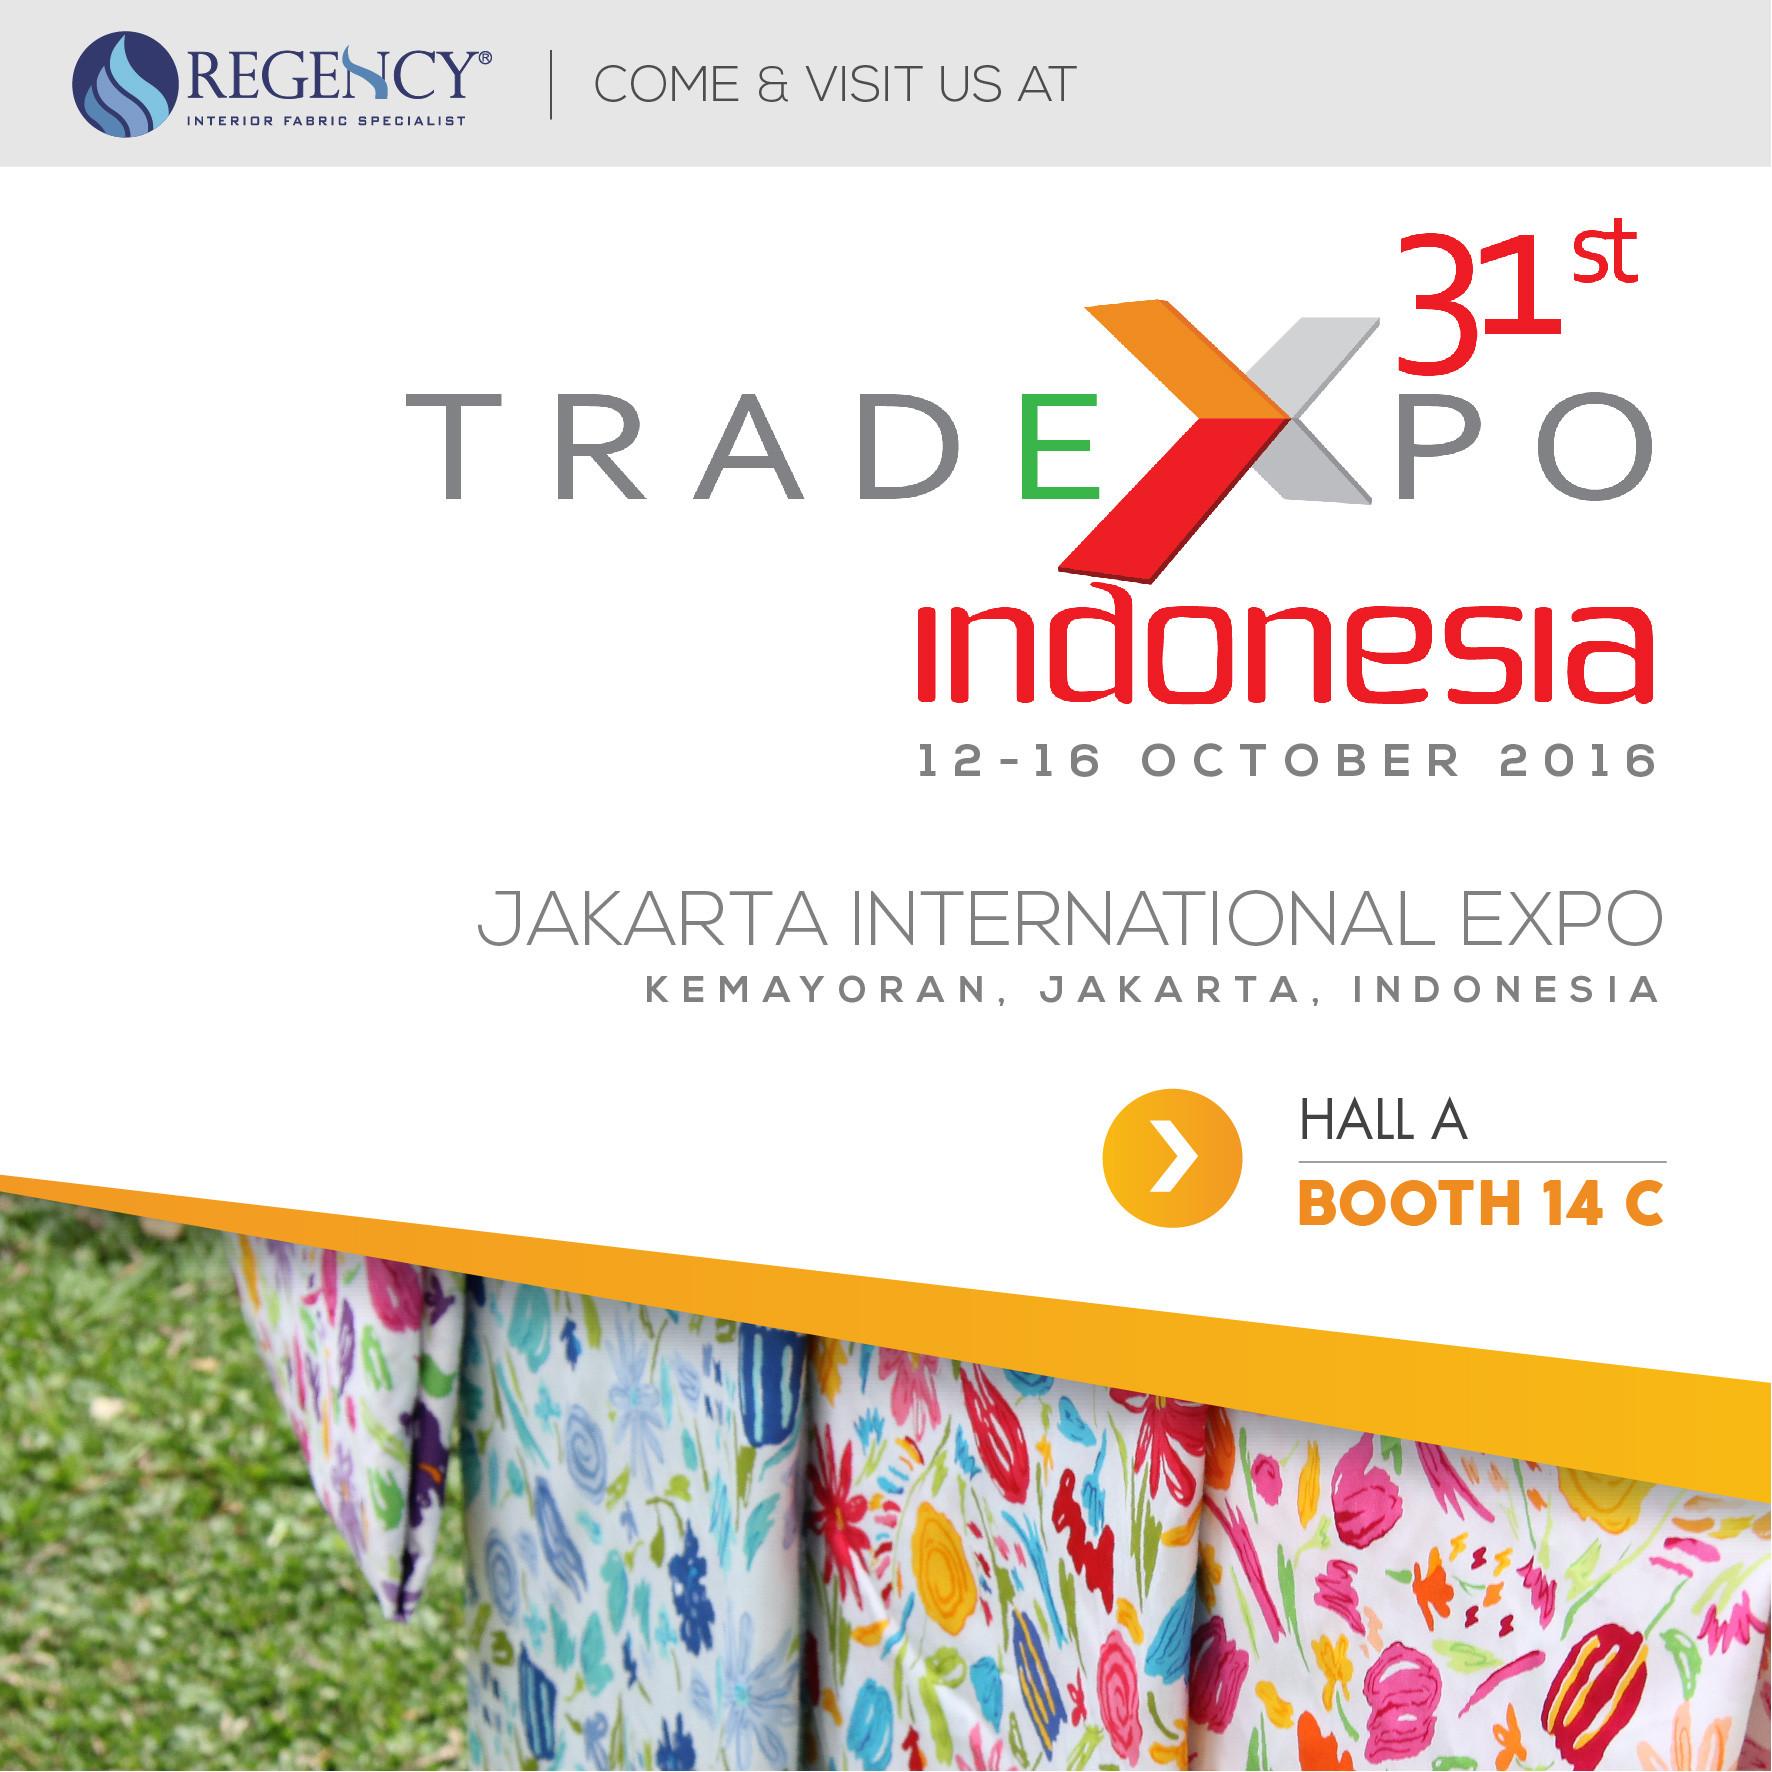 PT Sinar - Interior Fabric and Textile Manufacturer Indonesia